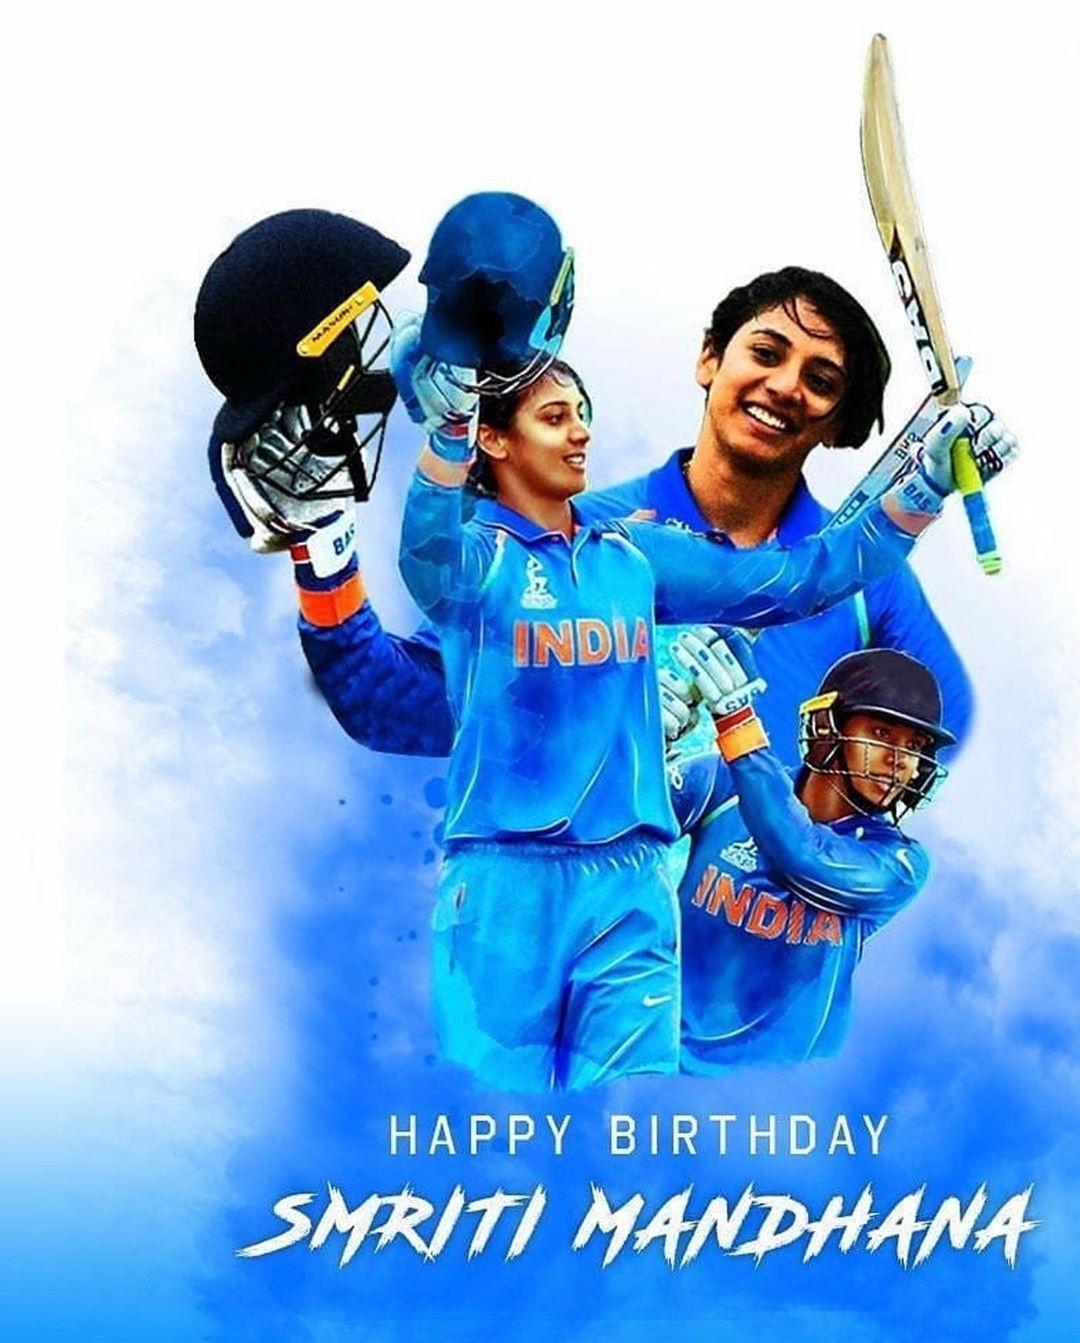 Pin by Mastan Jara on heros Smriti mandhana, Cricket